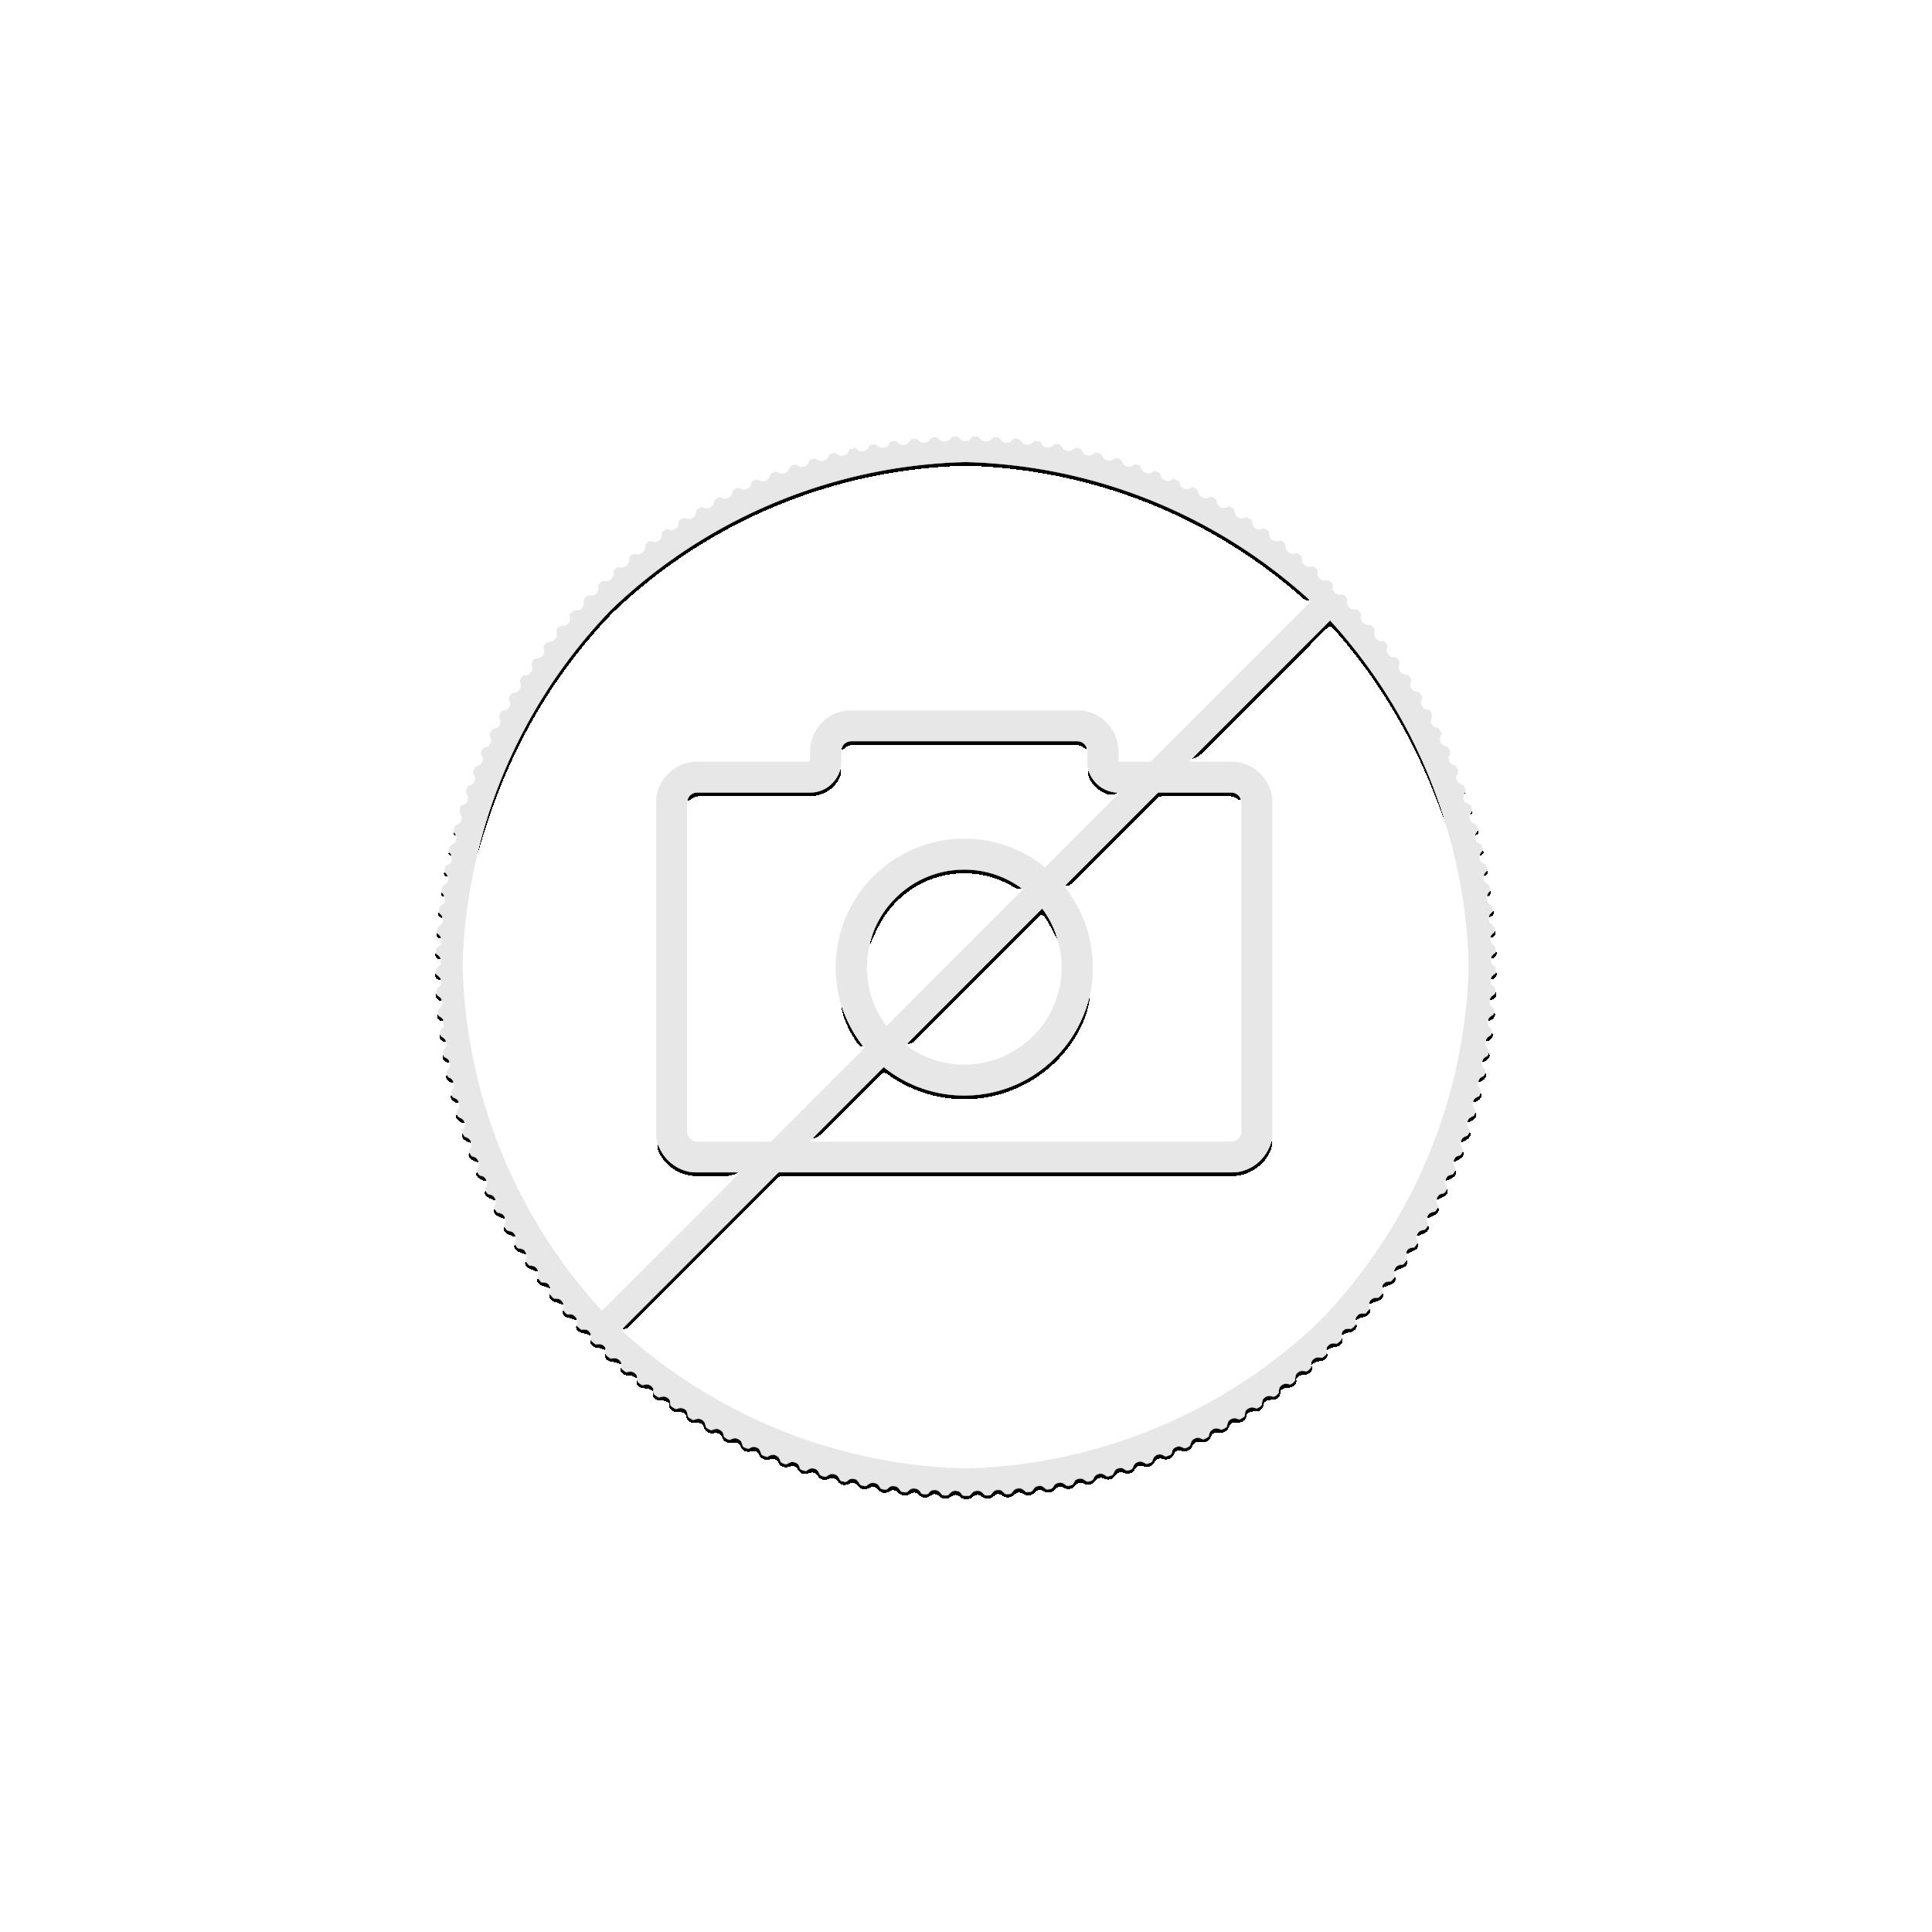 Gold Britannia coin 1/10 troy ounce 2022